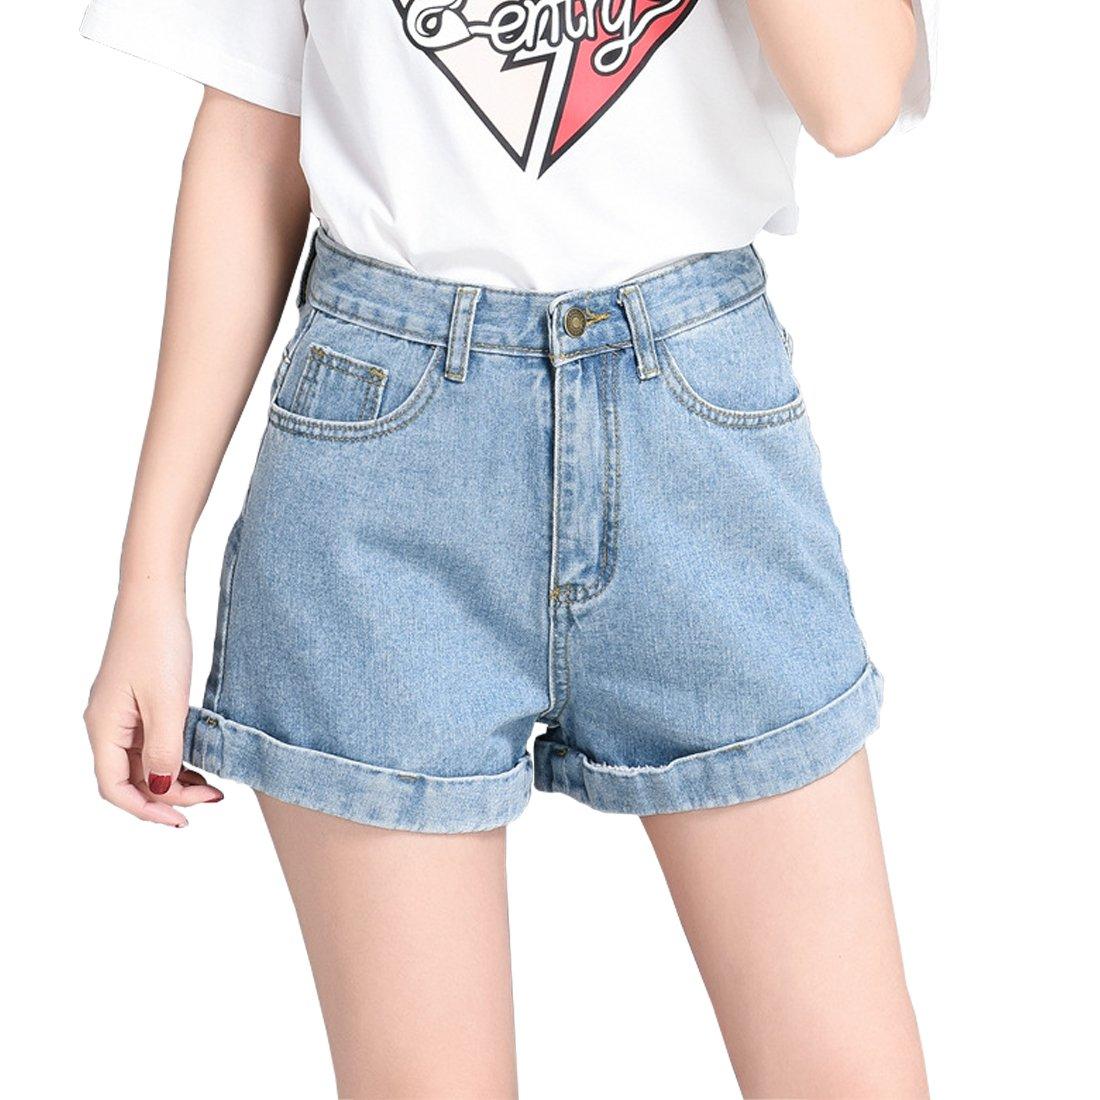 Weigou Woman Denim Shorts Juniors Vintage Denim High Waist Folded Hem Jeans Shorts (Blue, L)